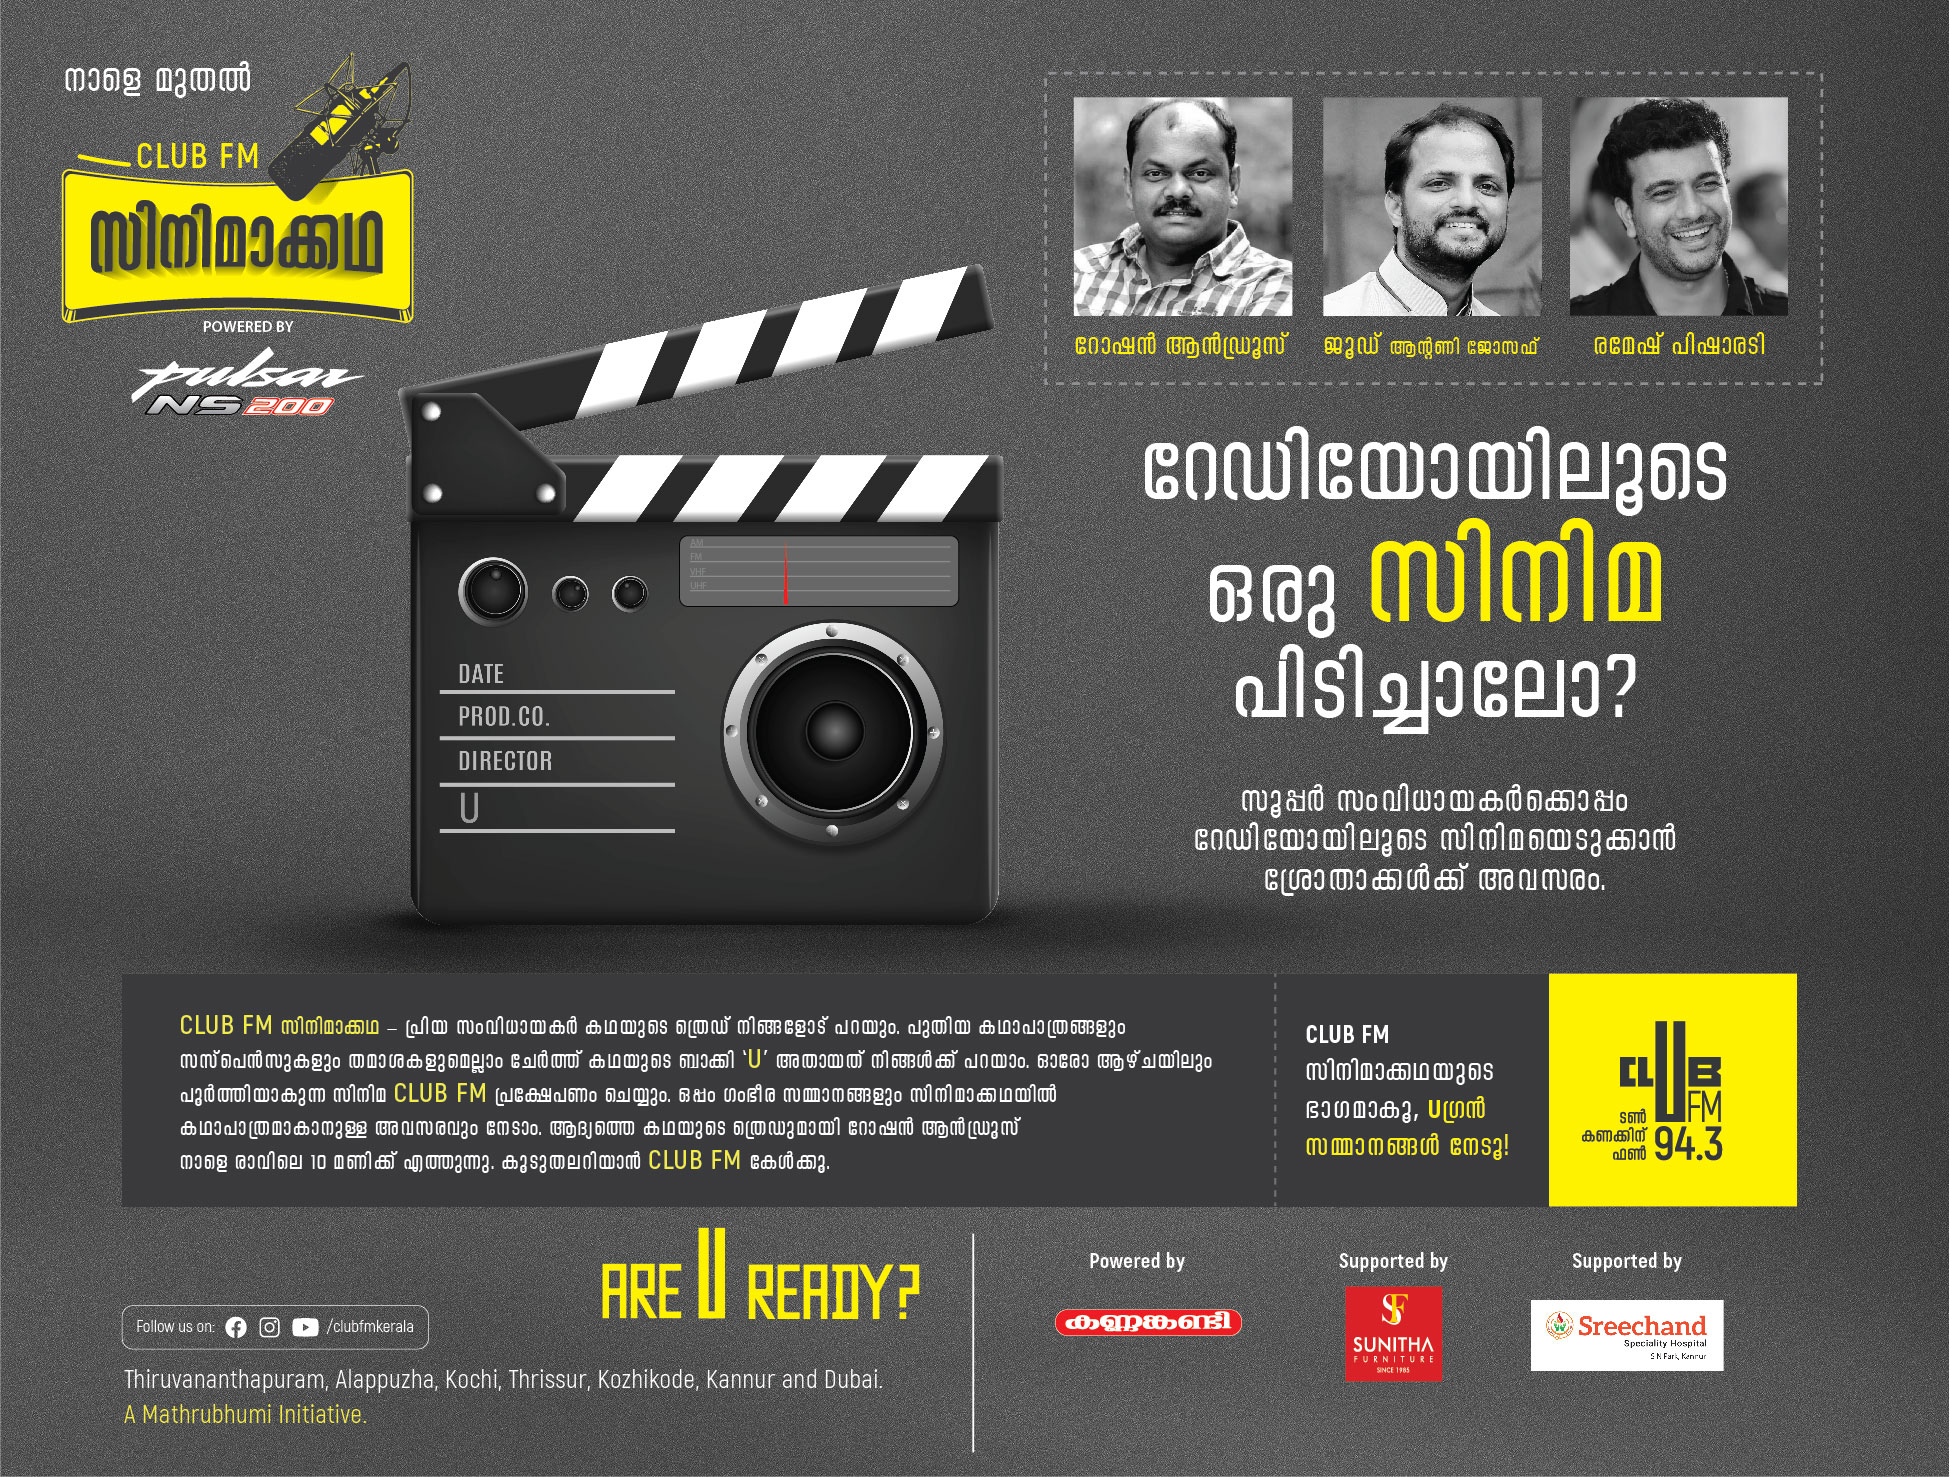 Club-FM-Cinemakadha.jpg